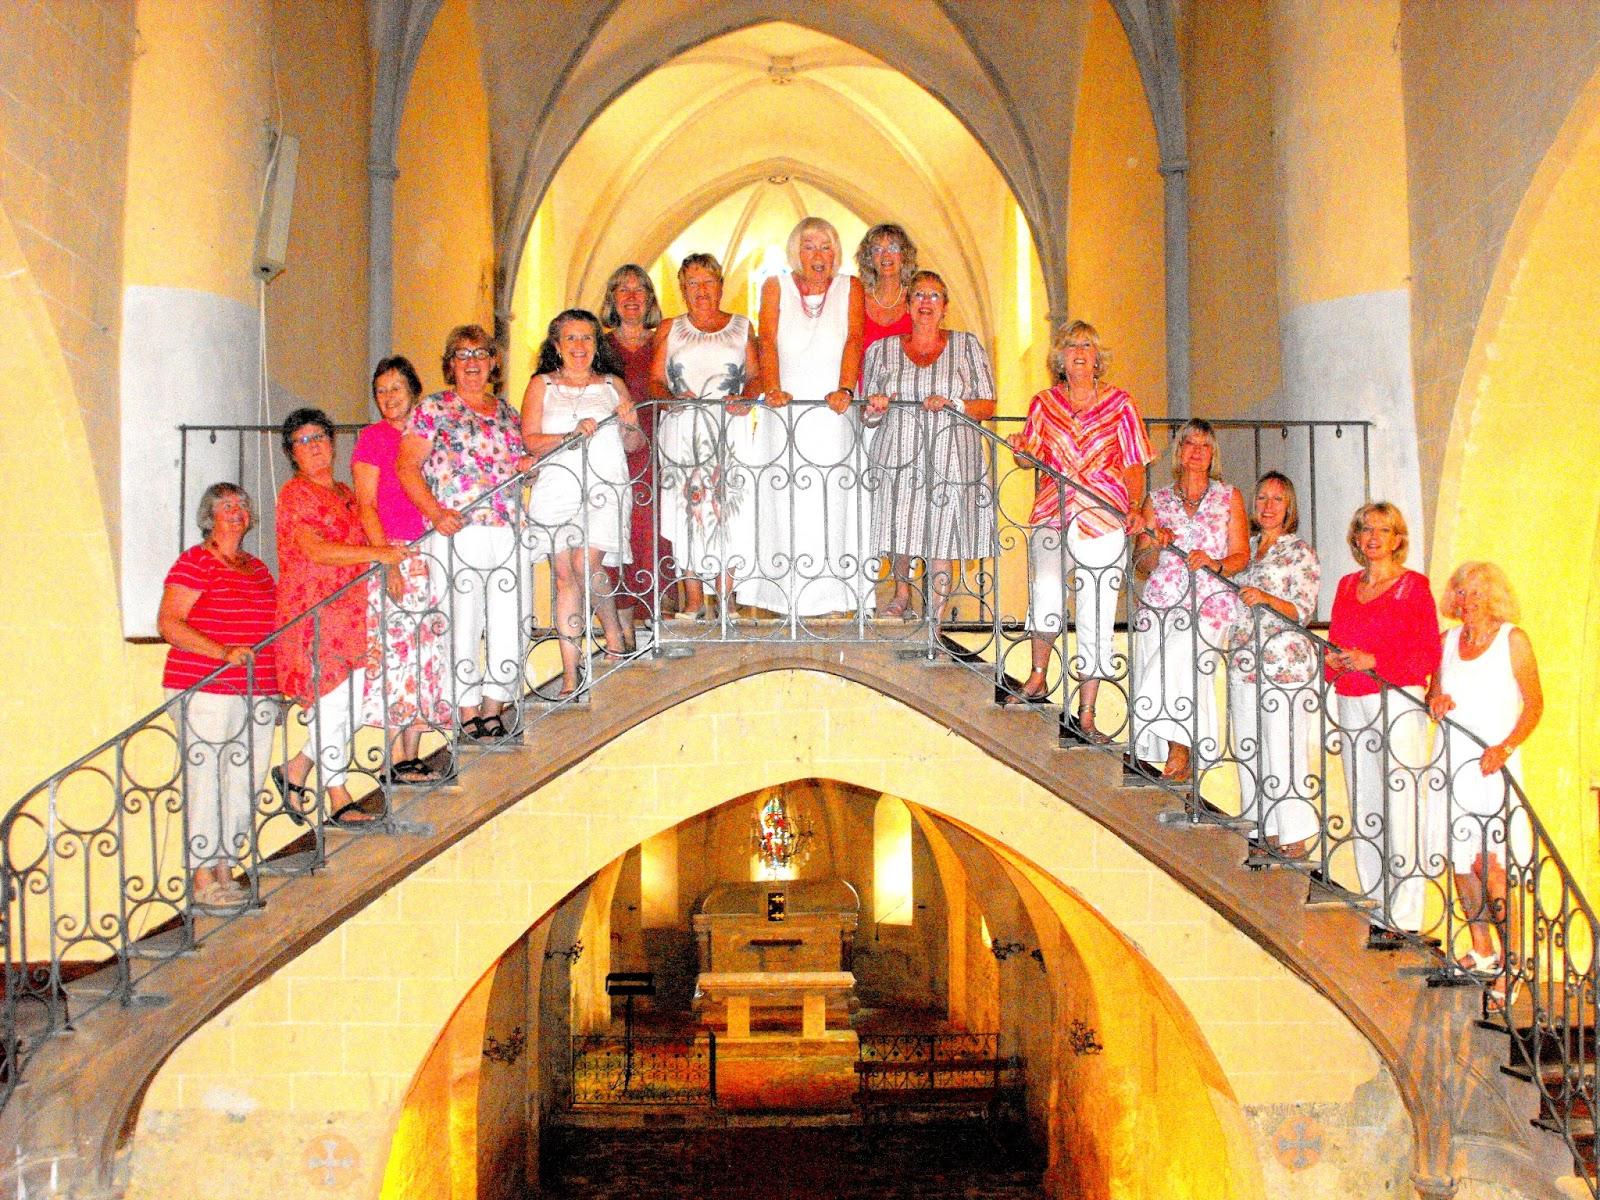 Gascogne Ladies Club (GLC): About Us